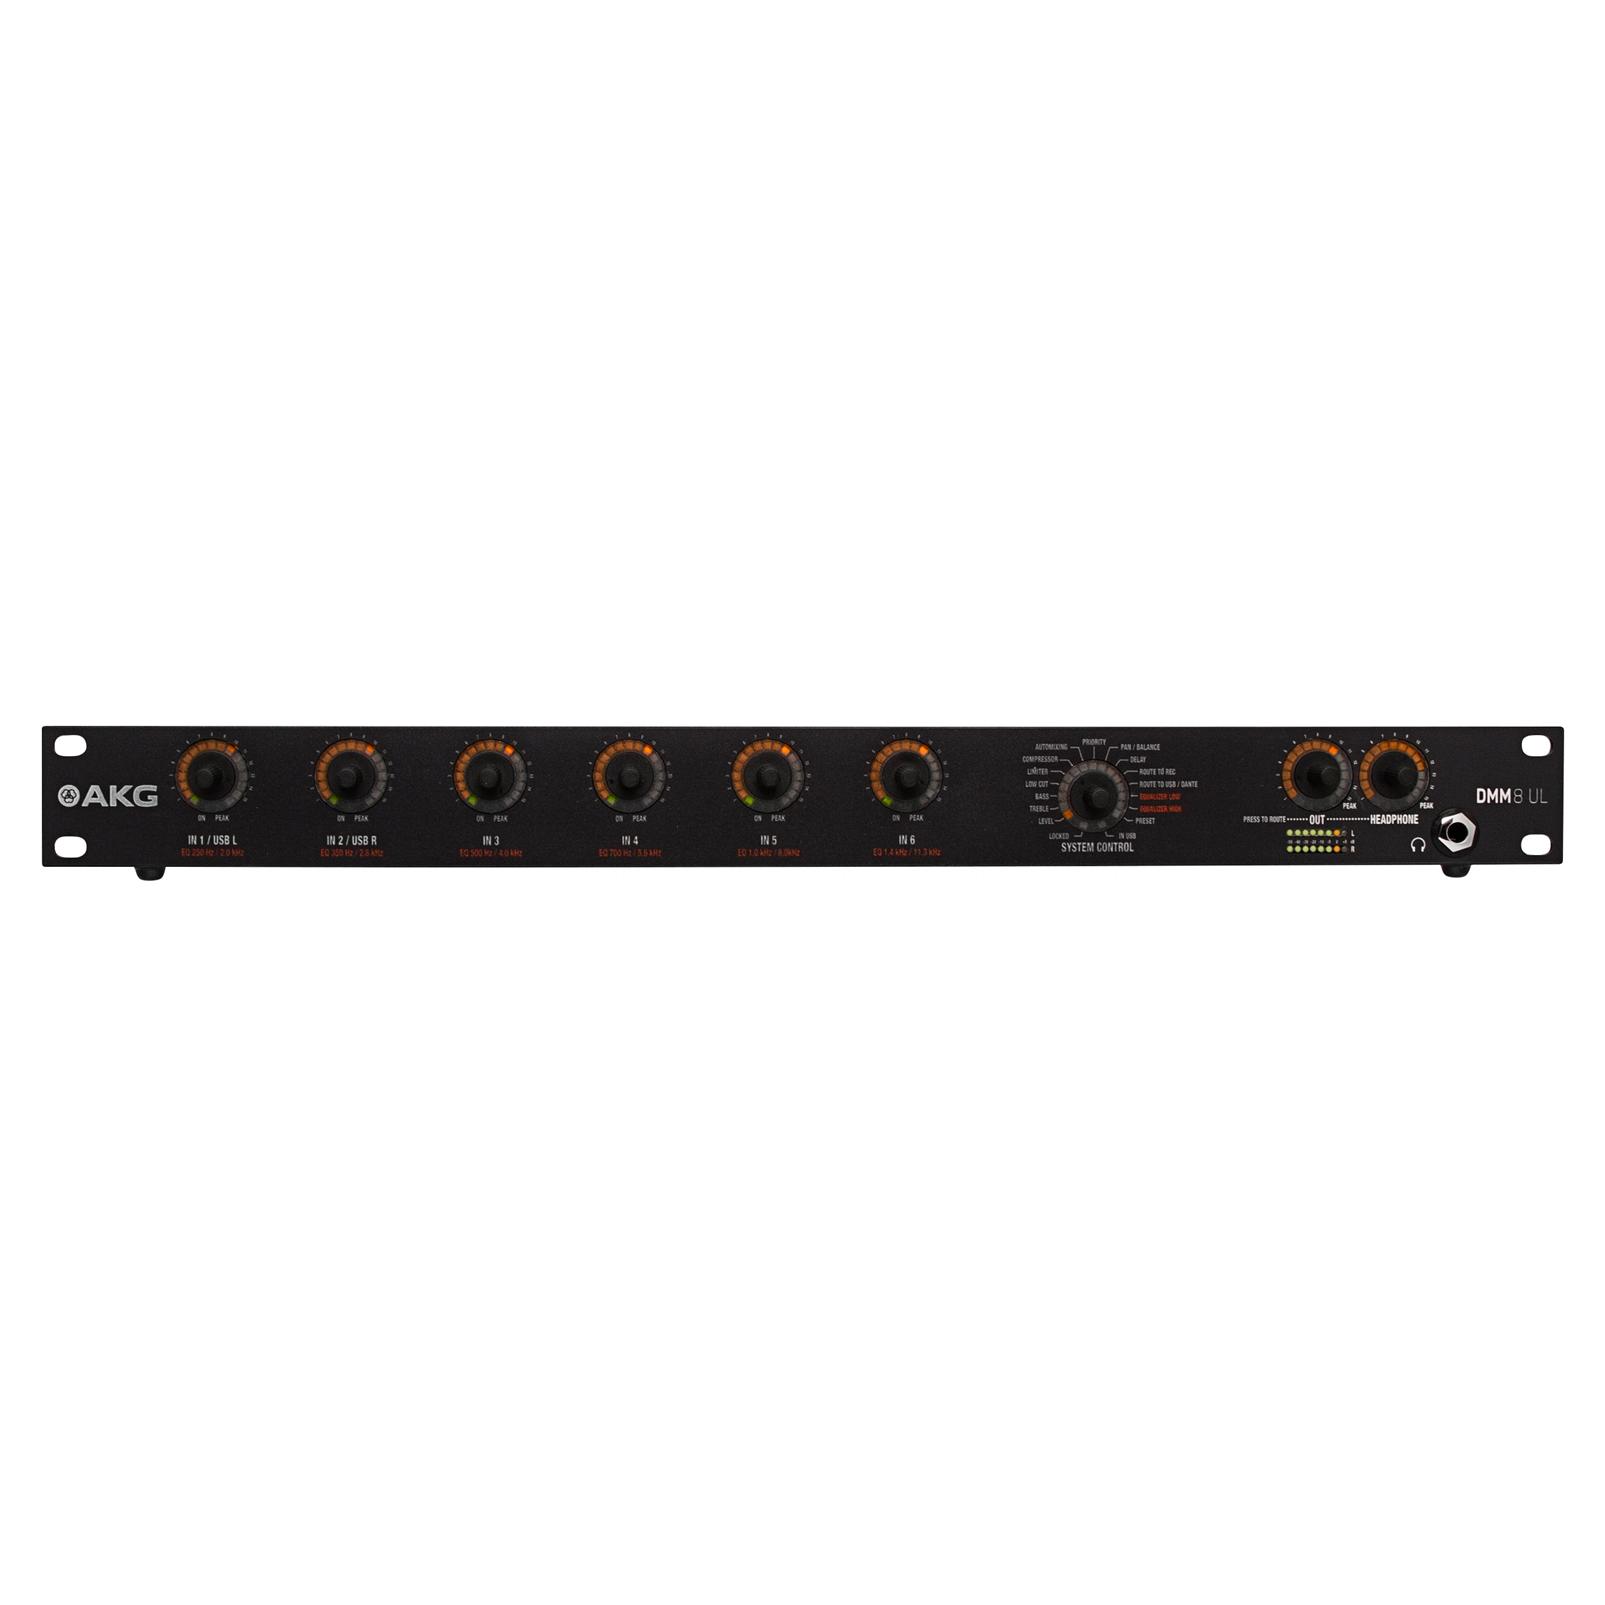 DMM8 UL - Black - Professional digital automatic microphone mixer w/LAN interface via Ethernet - Hero